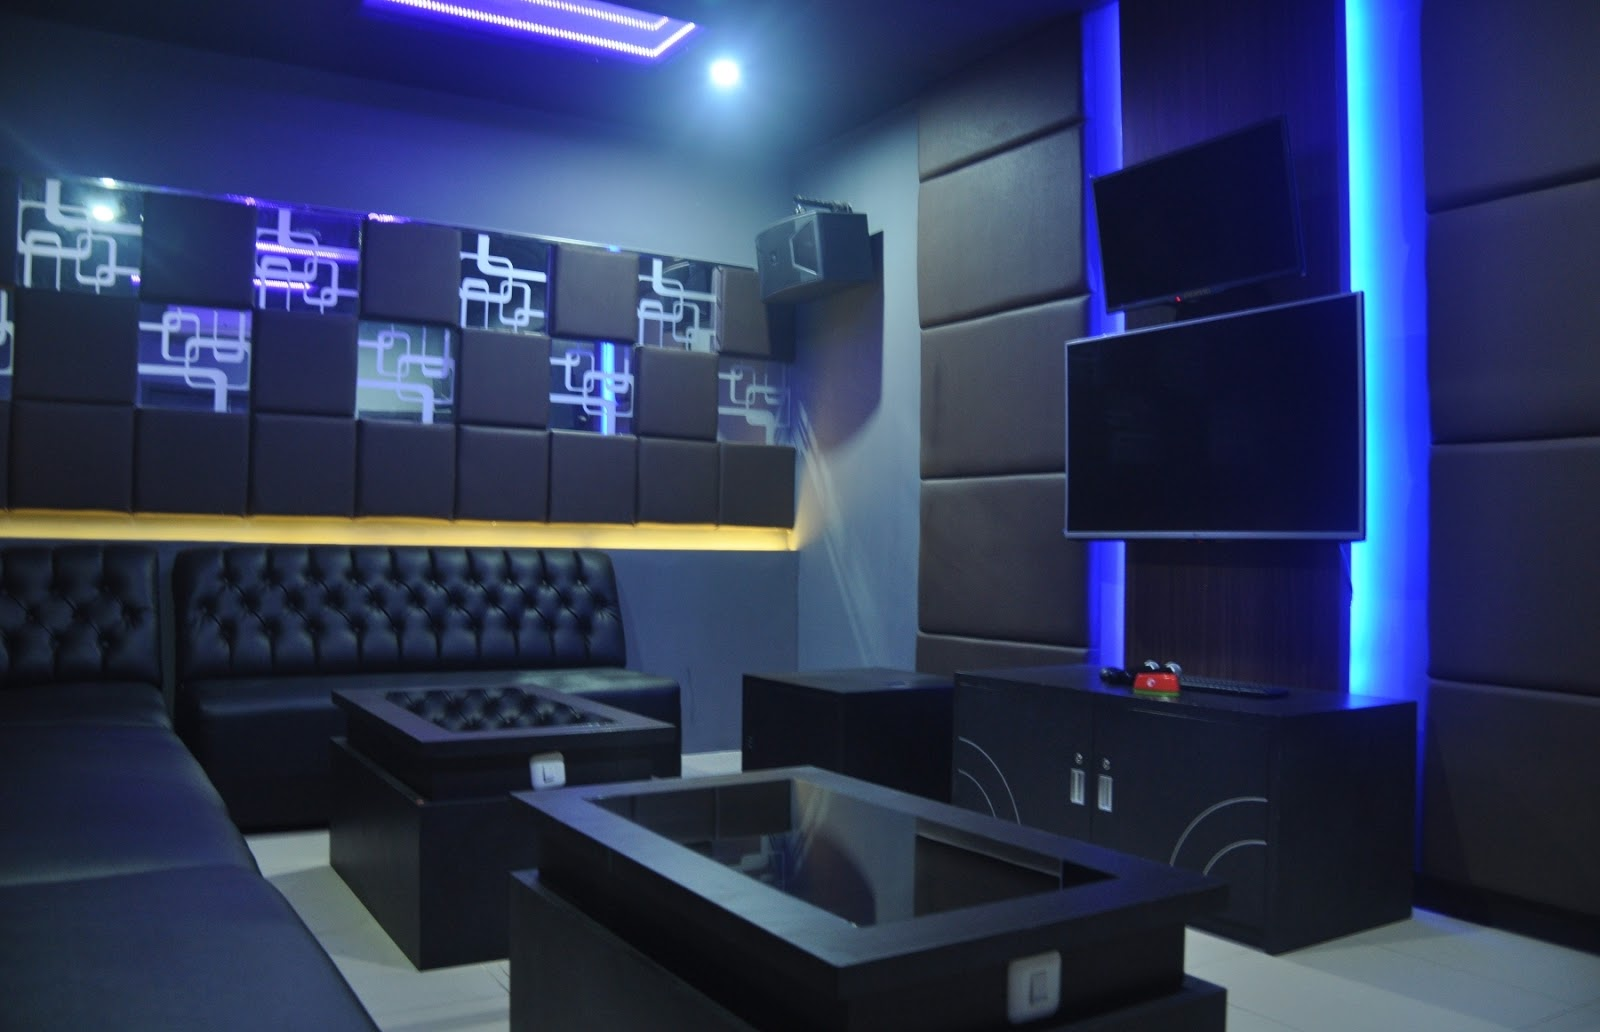 The best karaoke bars in Surakarta, Central Java